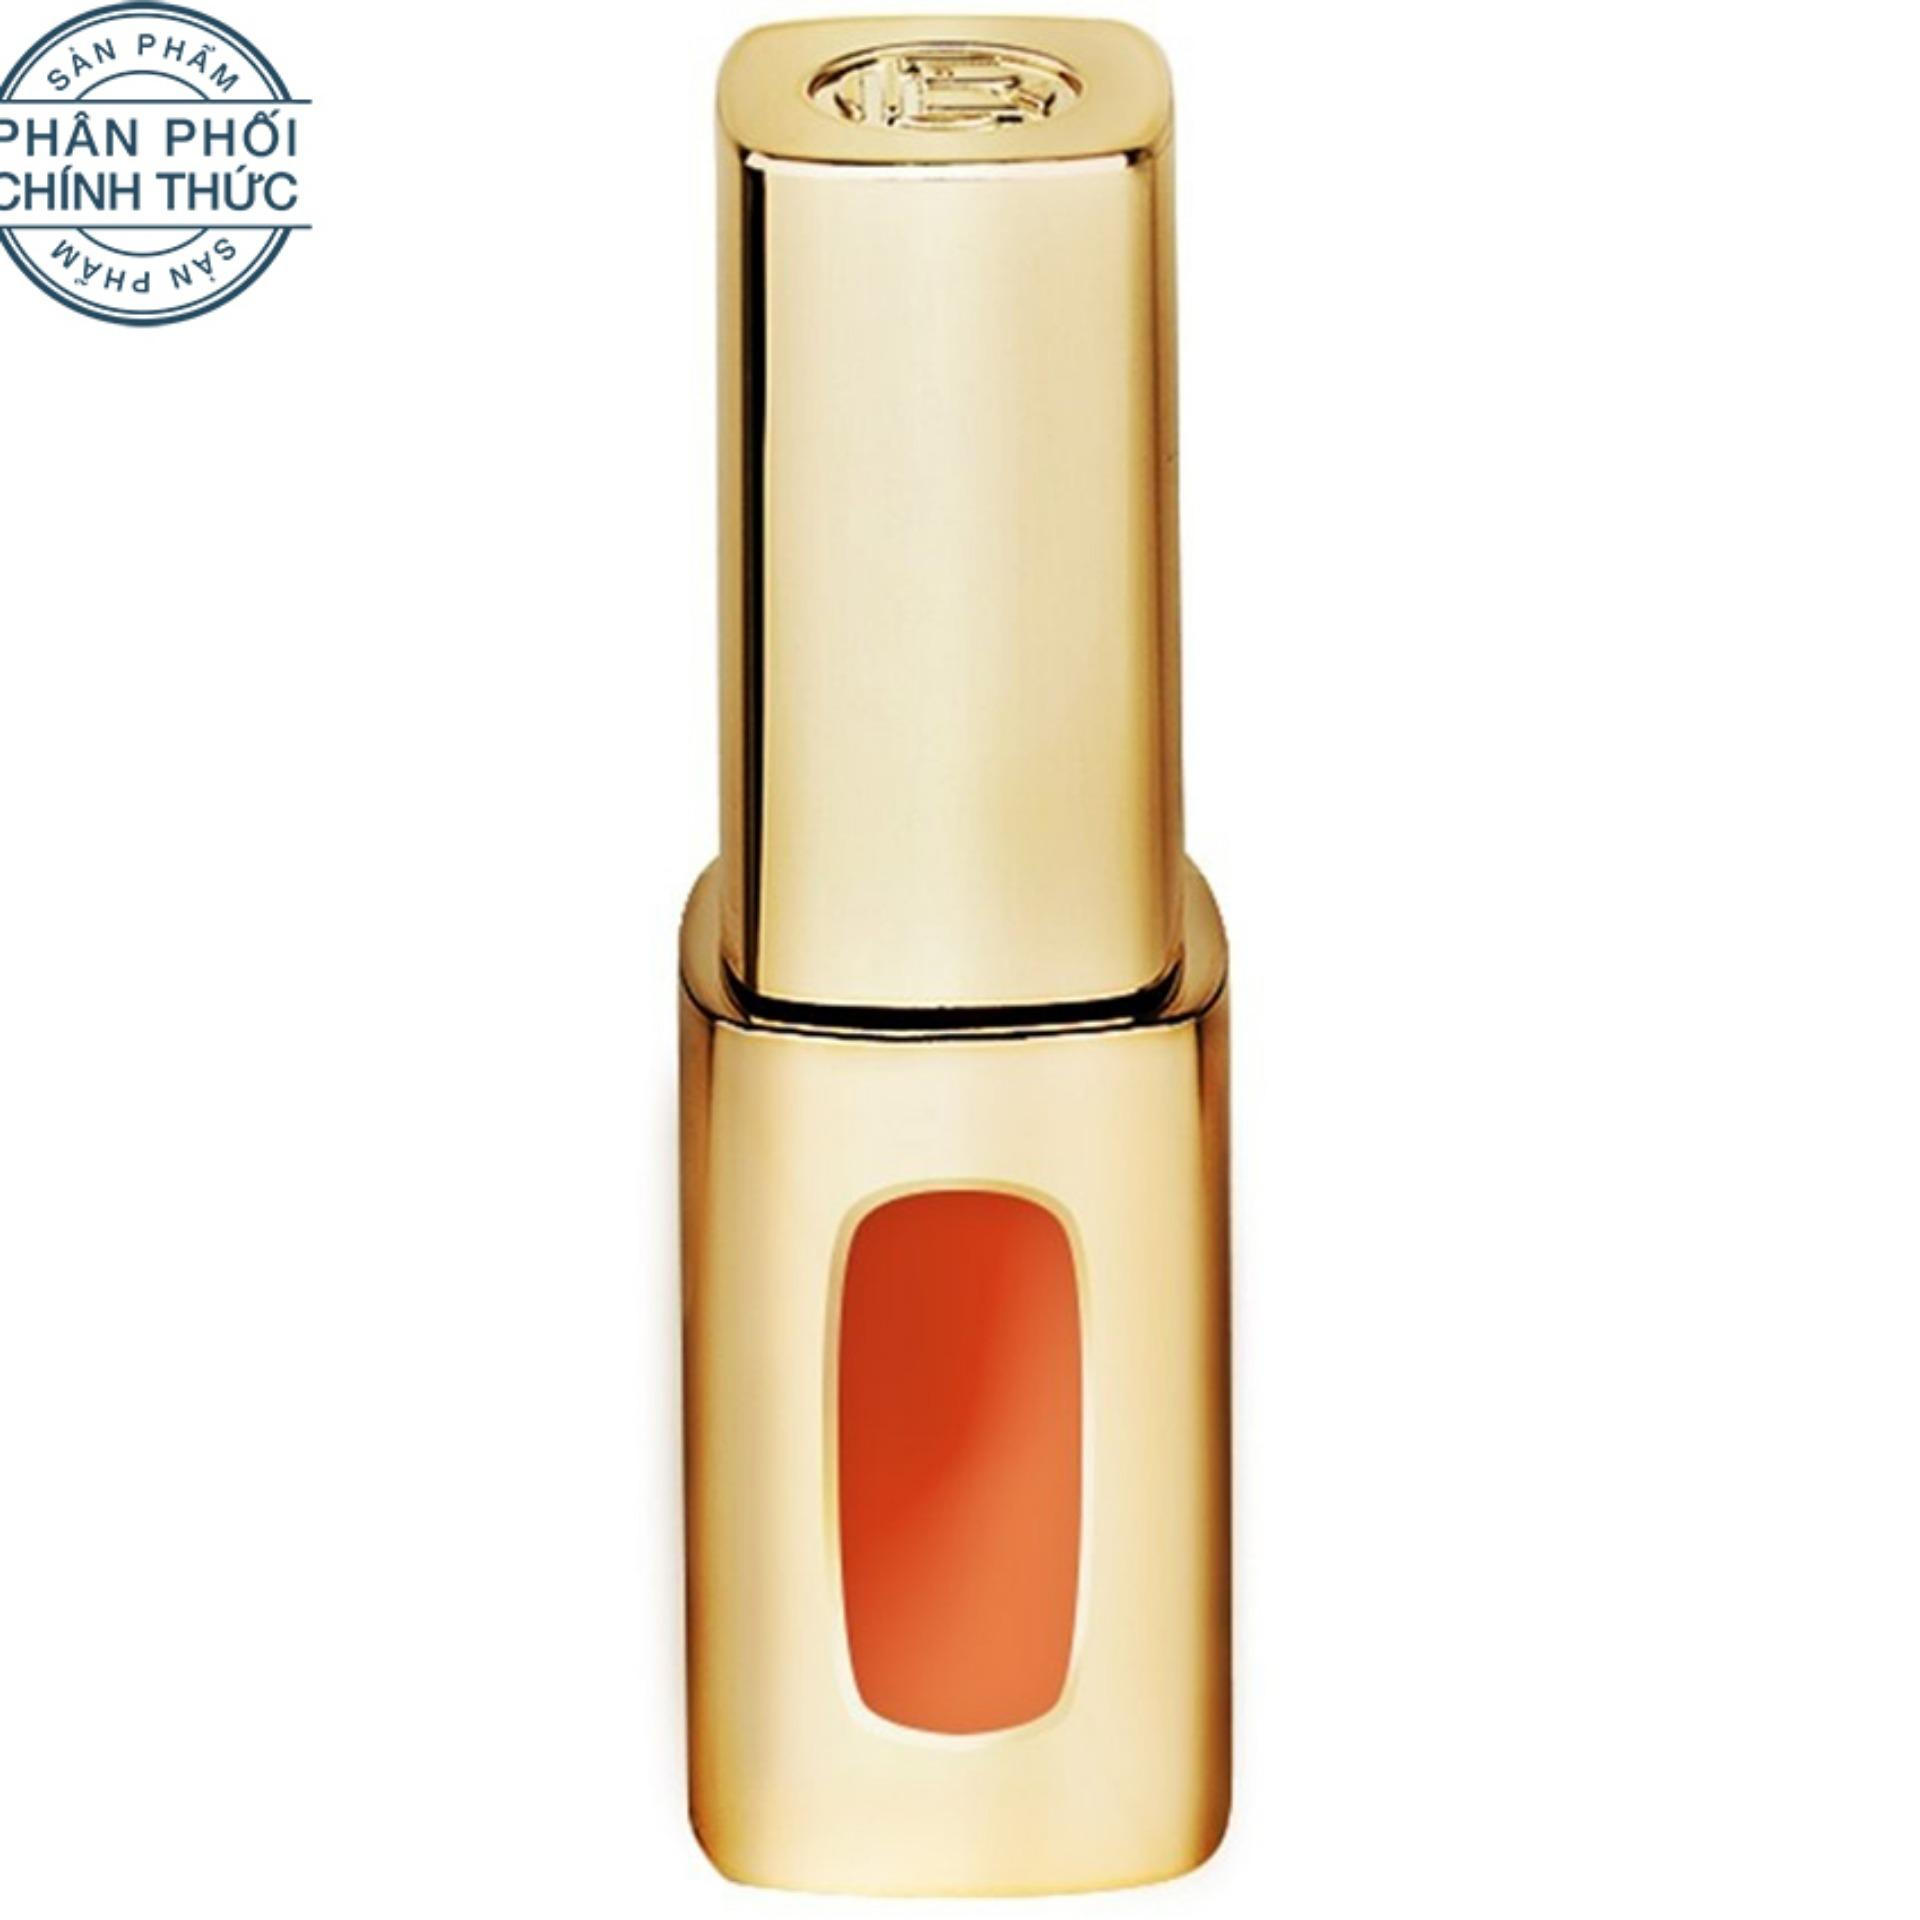 Giá Bán Son Nước L Oreal Paris Extraordinaire 204 Tangerine So 5 5Ml Mới Nhất